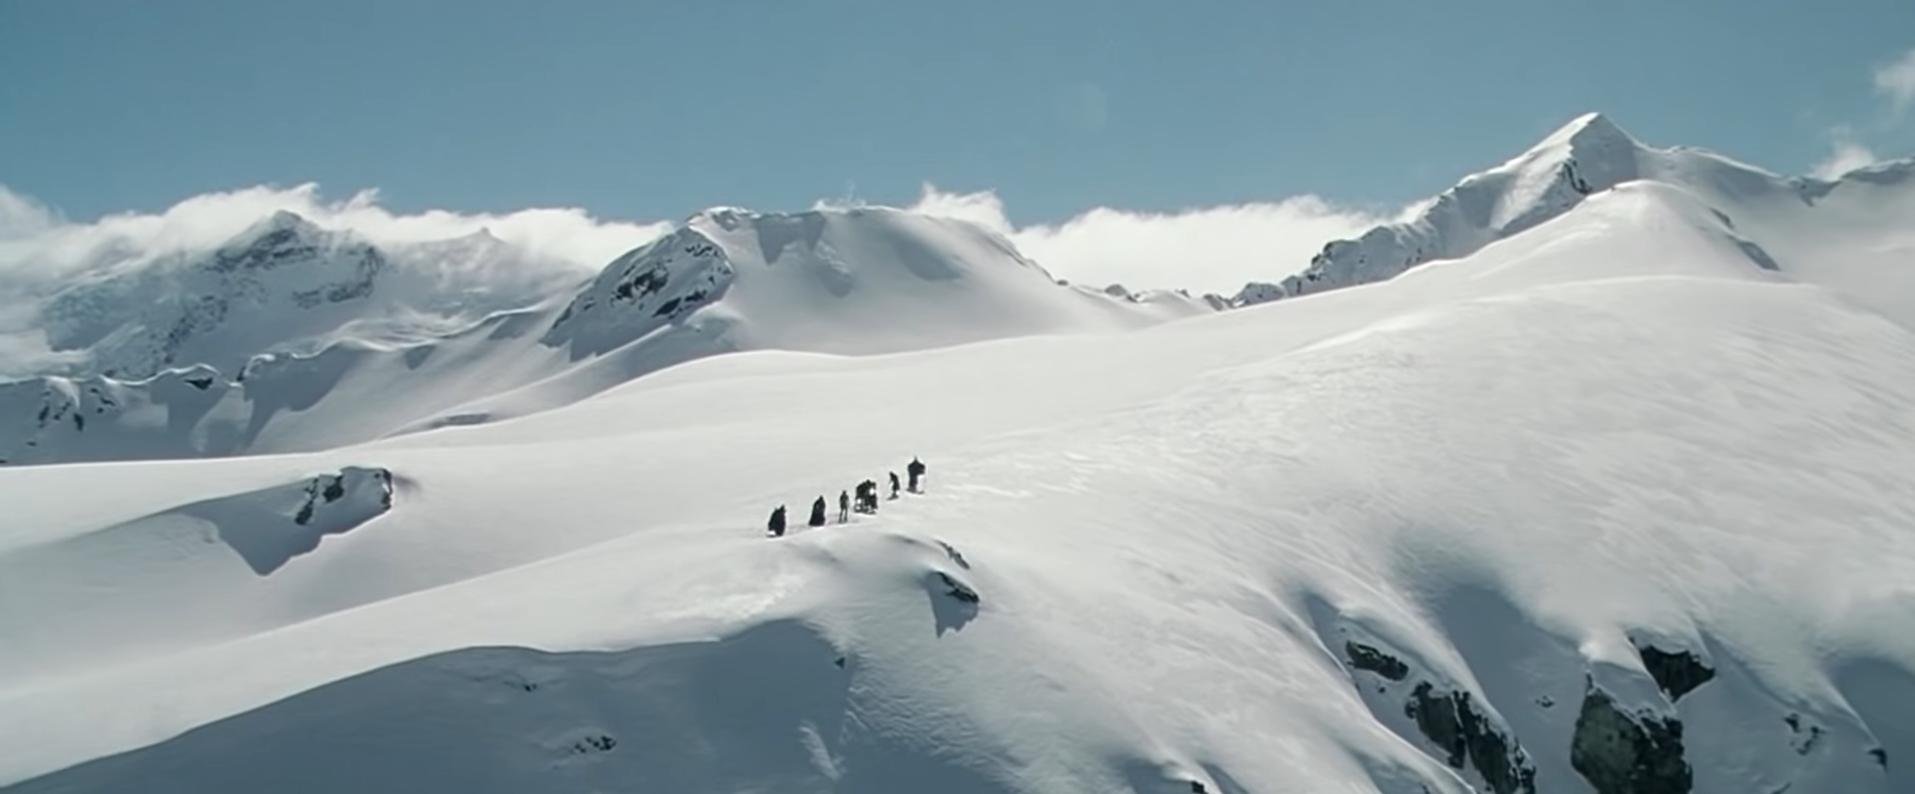 Mountains of Moria